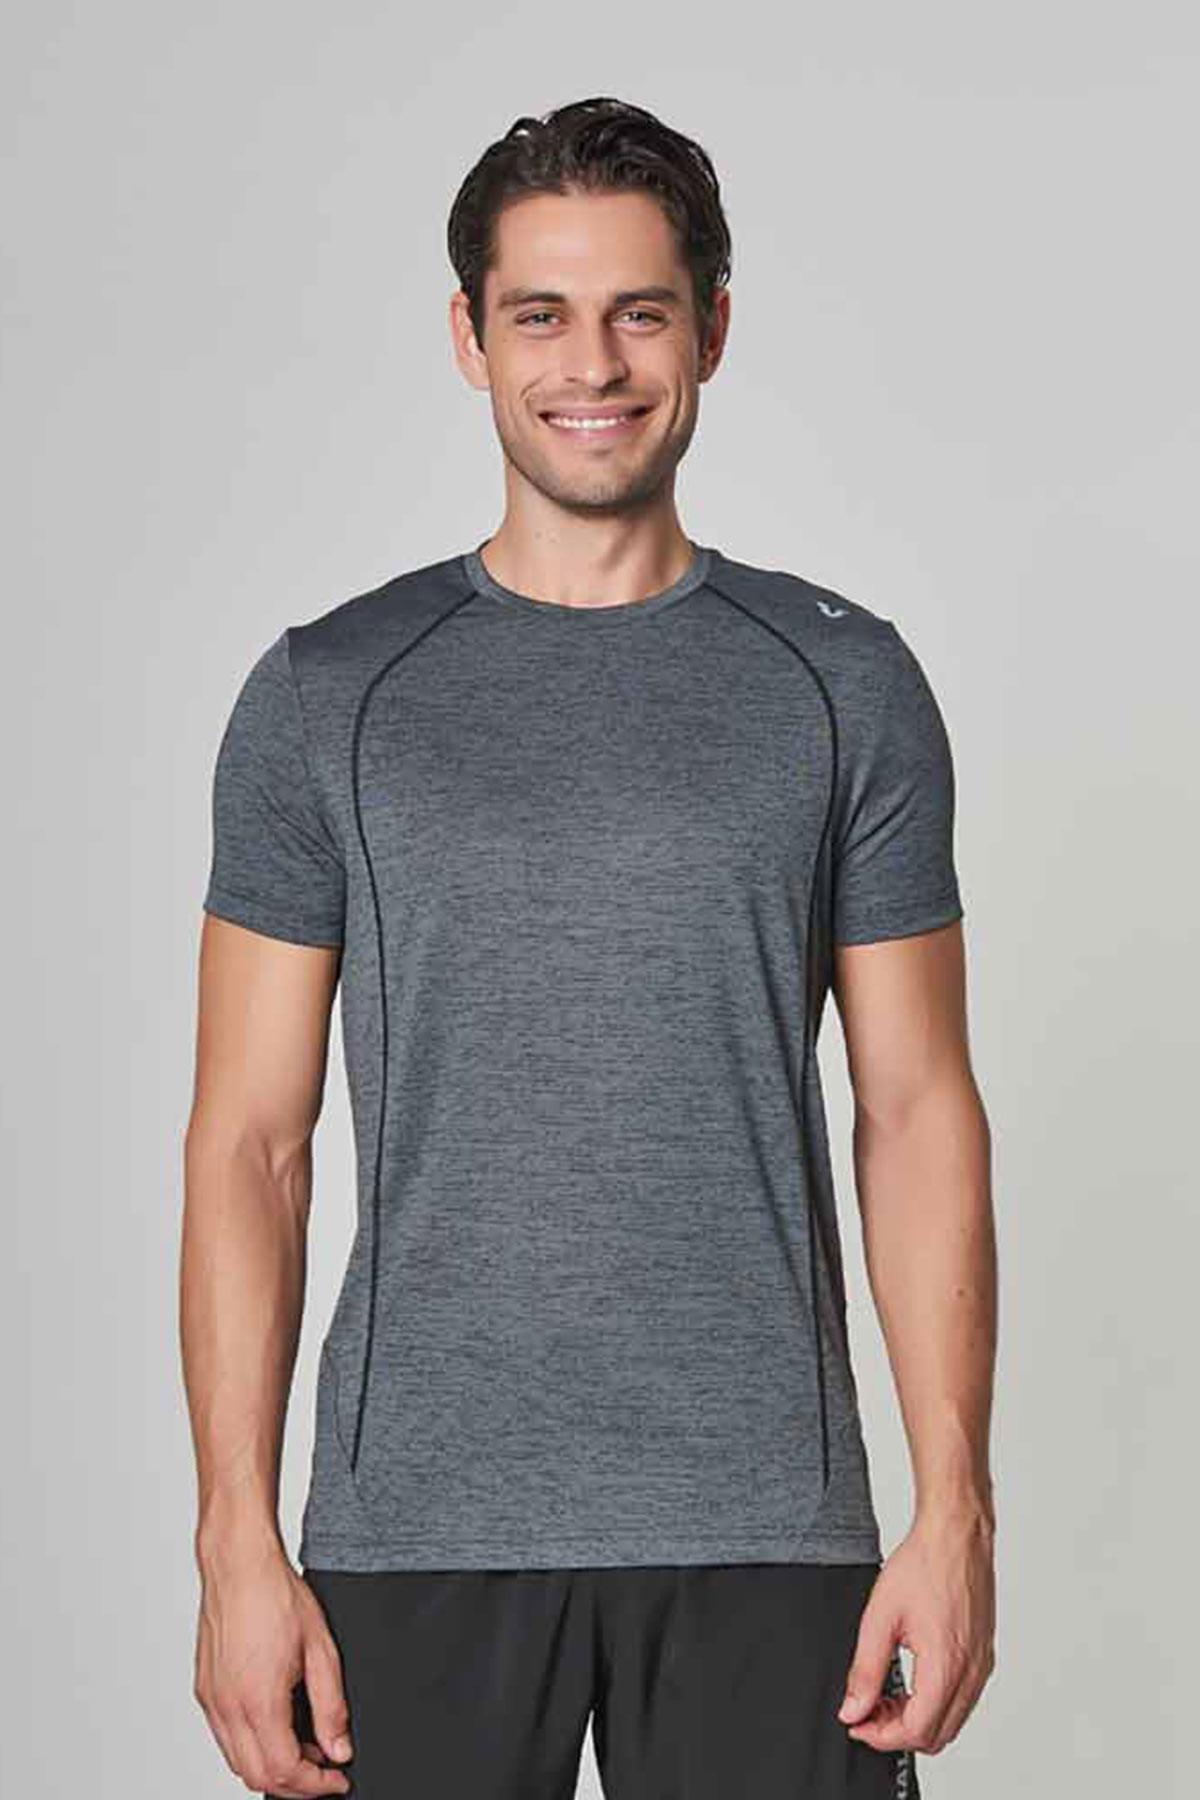 Bilcee Erkek Antrenman T-Shirt DW-2272 BİLCEE